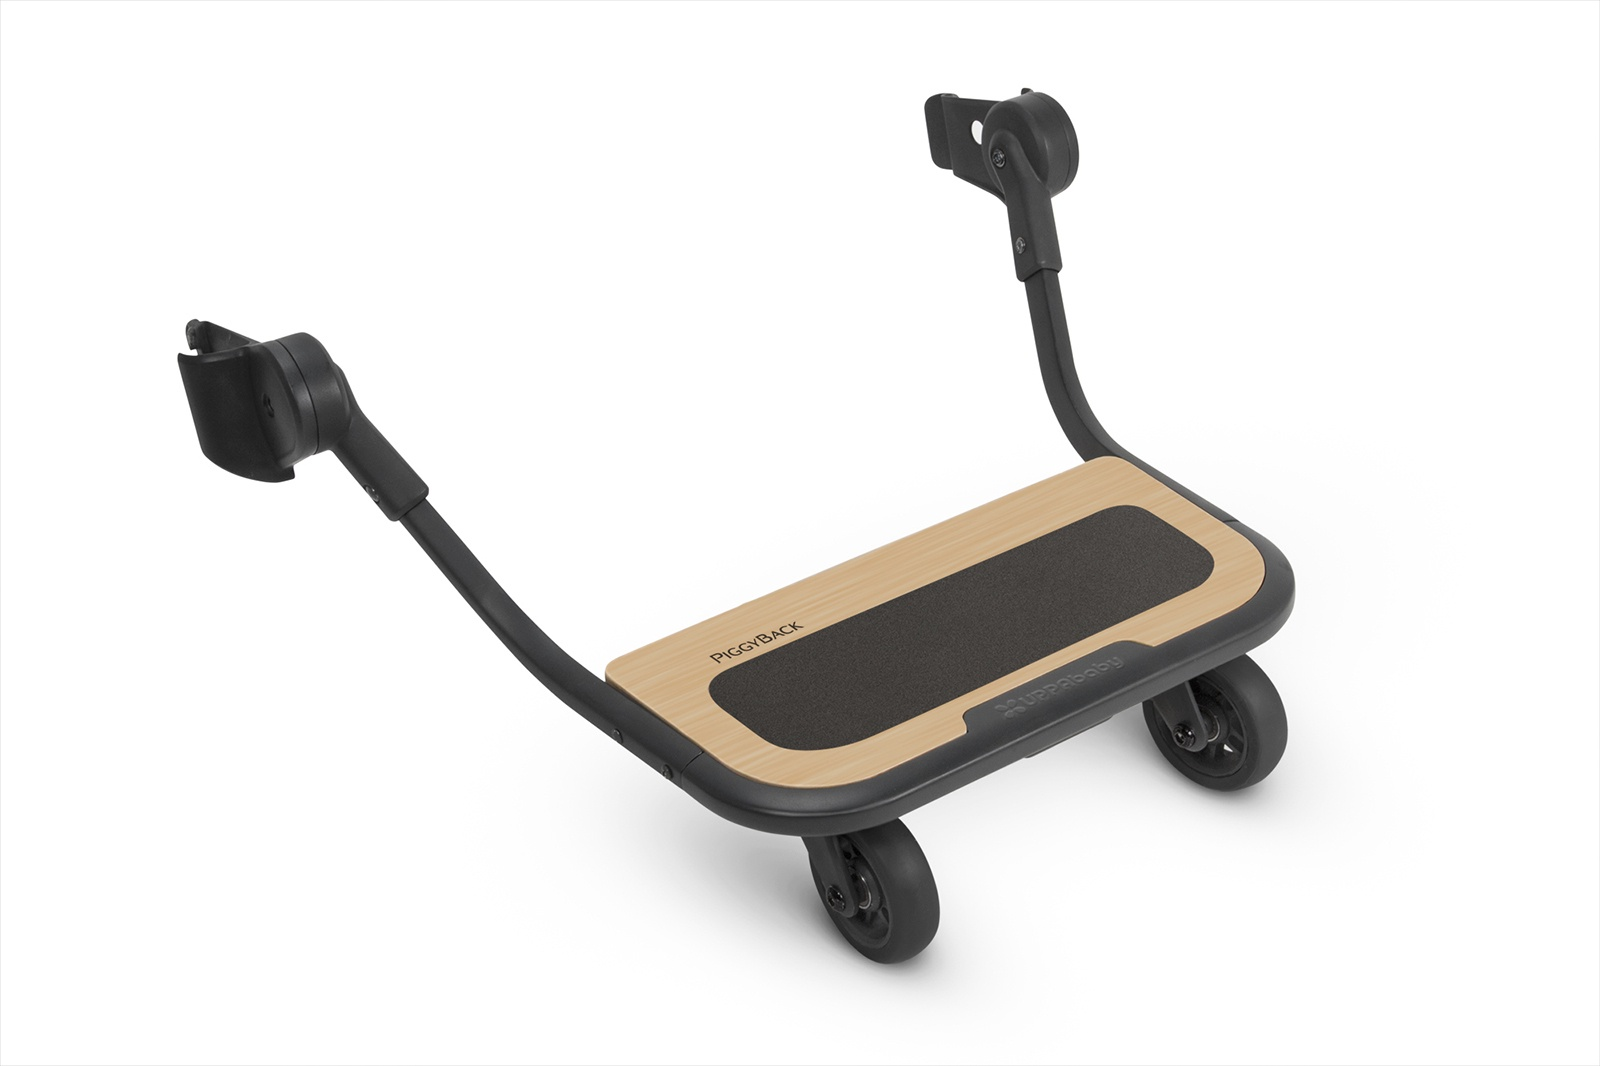 Аксессуар для колясок UPPAbaby Подножка-скейт Vista